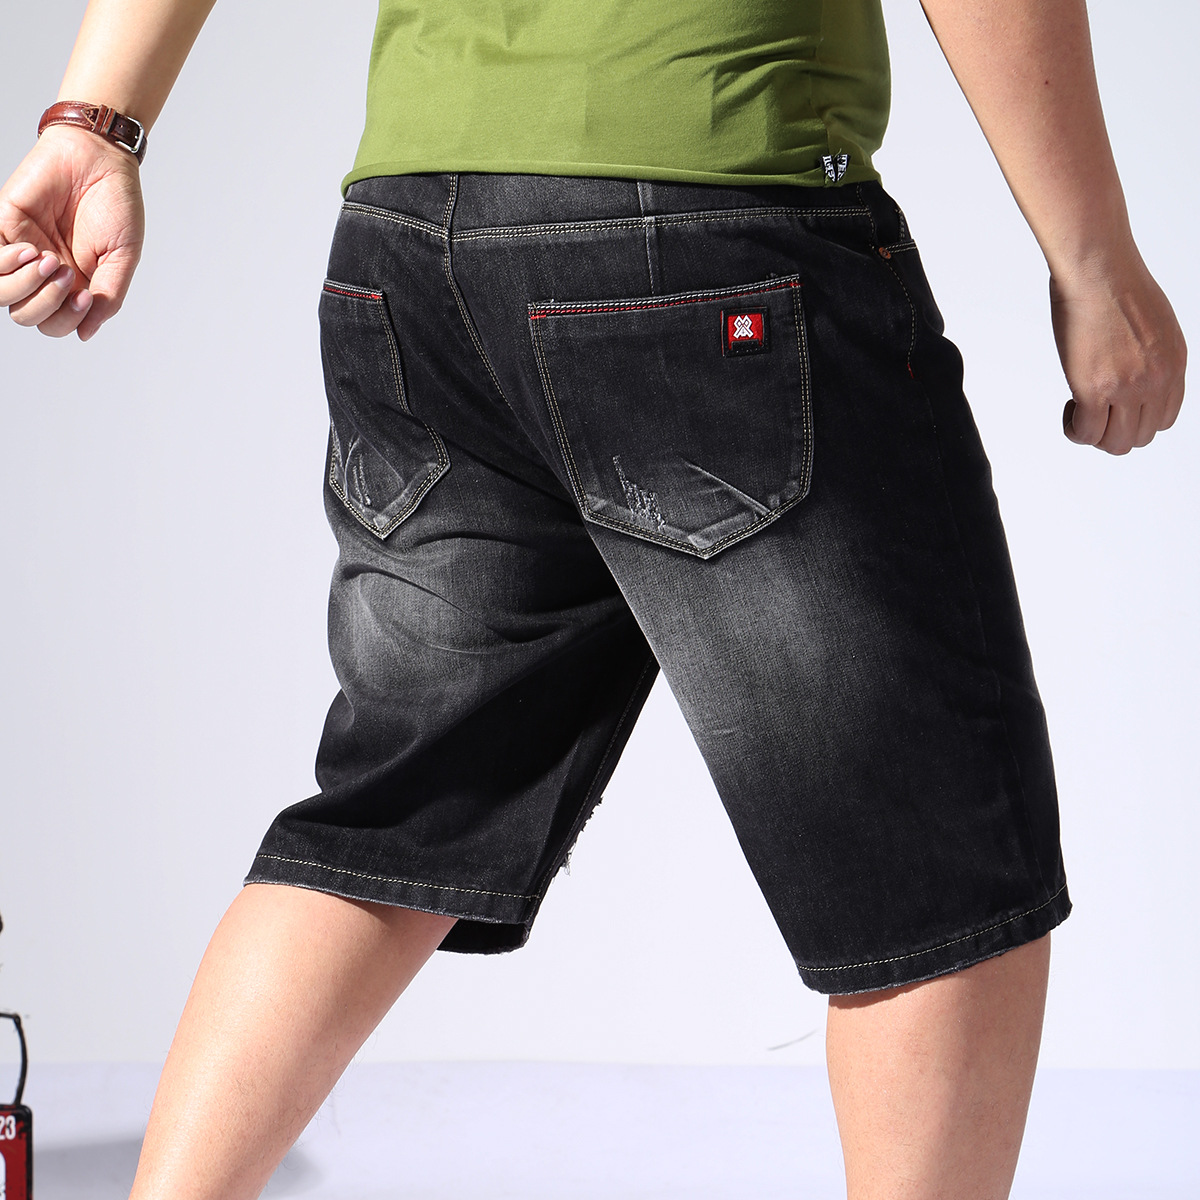 16703 No Bombs Large Size With Holes Denim Shorts Men's Plus-sized Breeches Summer Large Size Shorts Men's 32-48